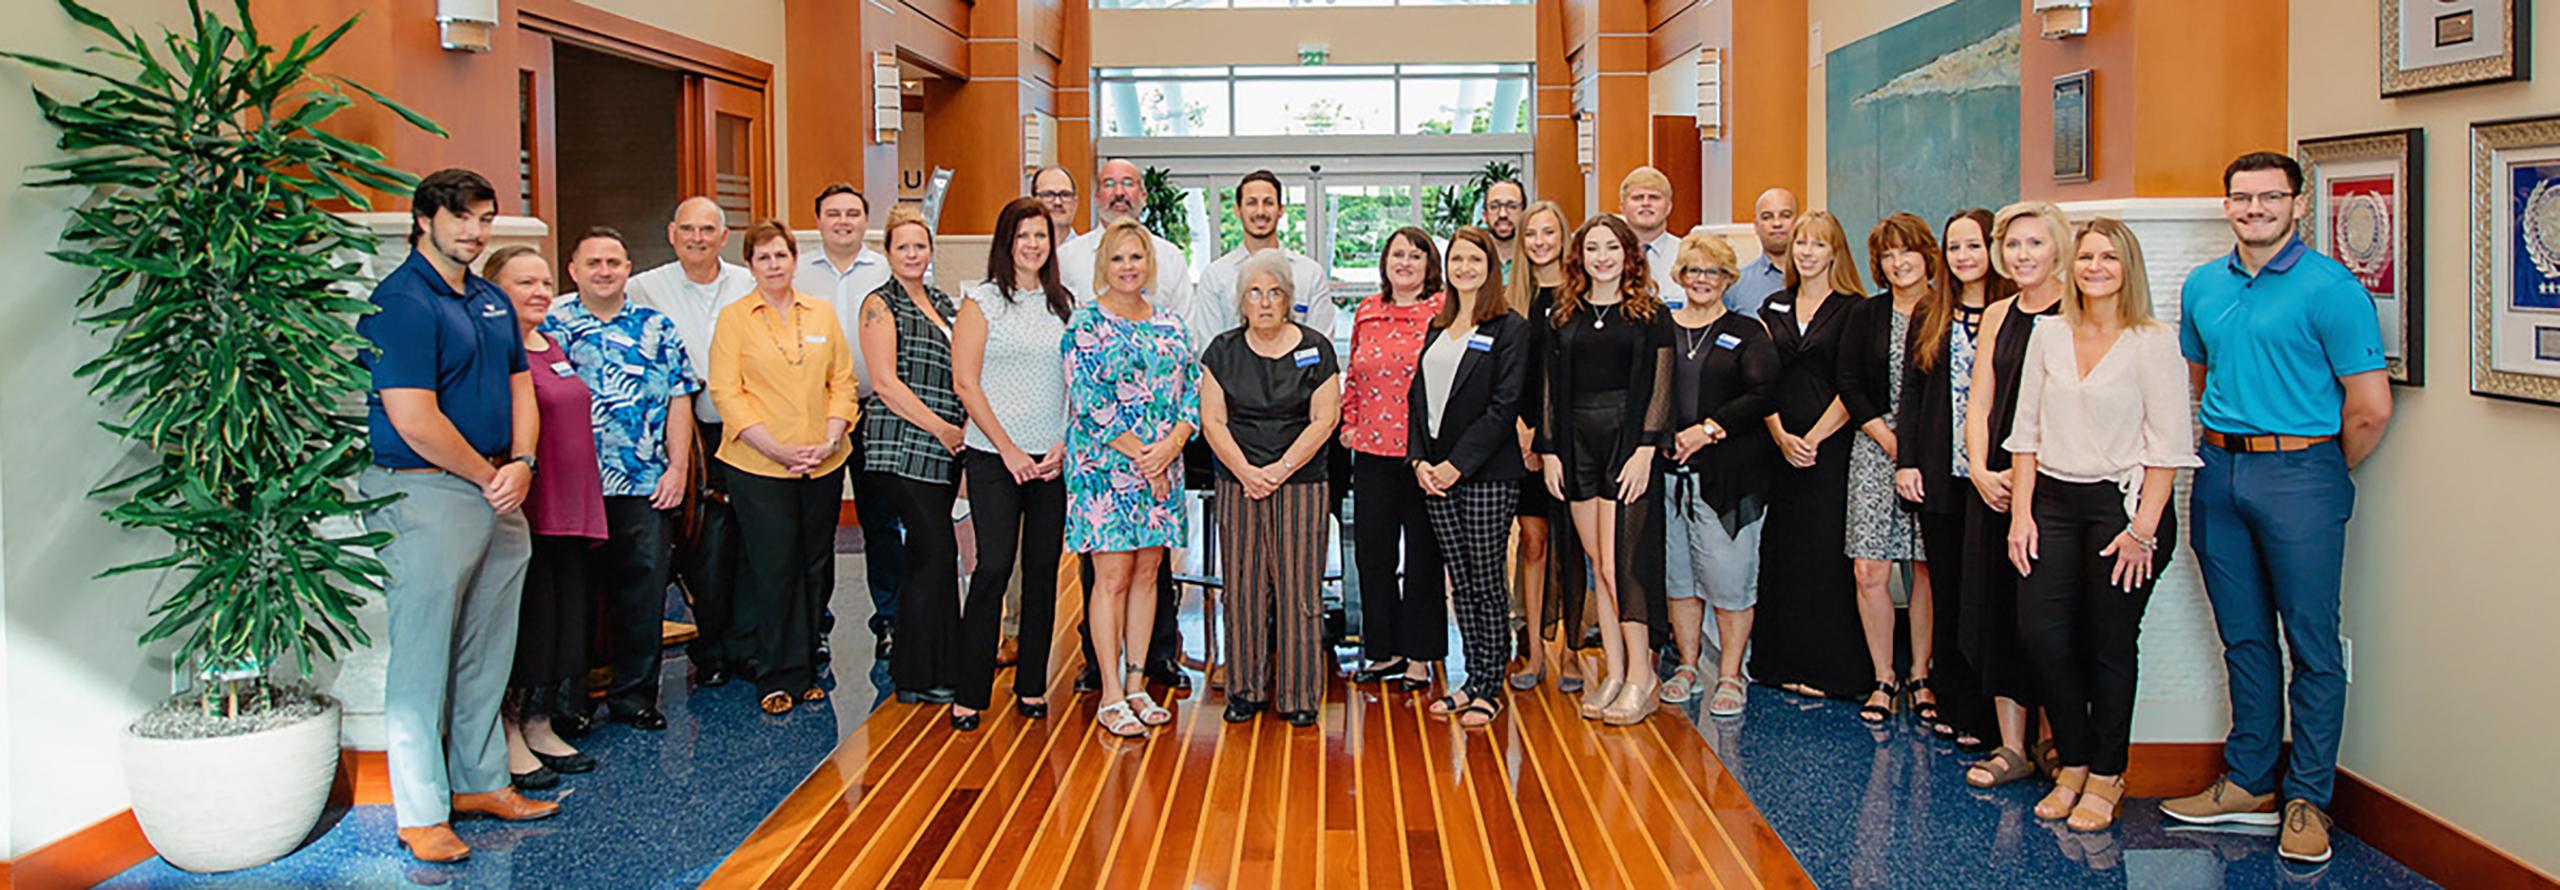 The Walters & Associates CPAs team photo